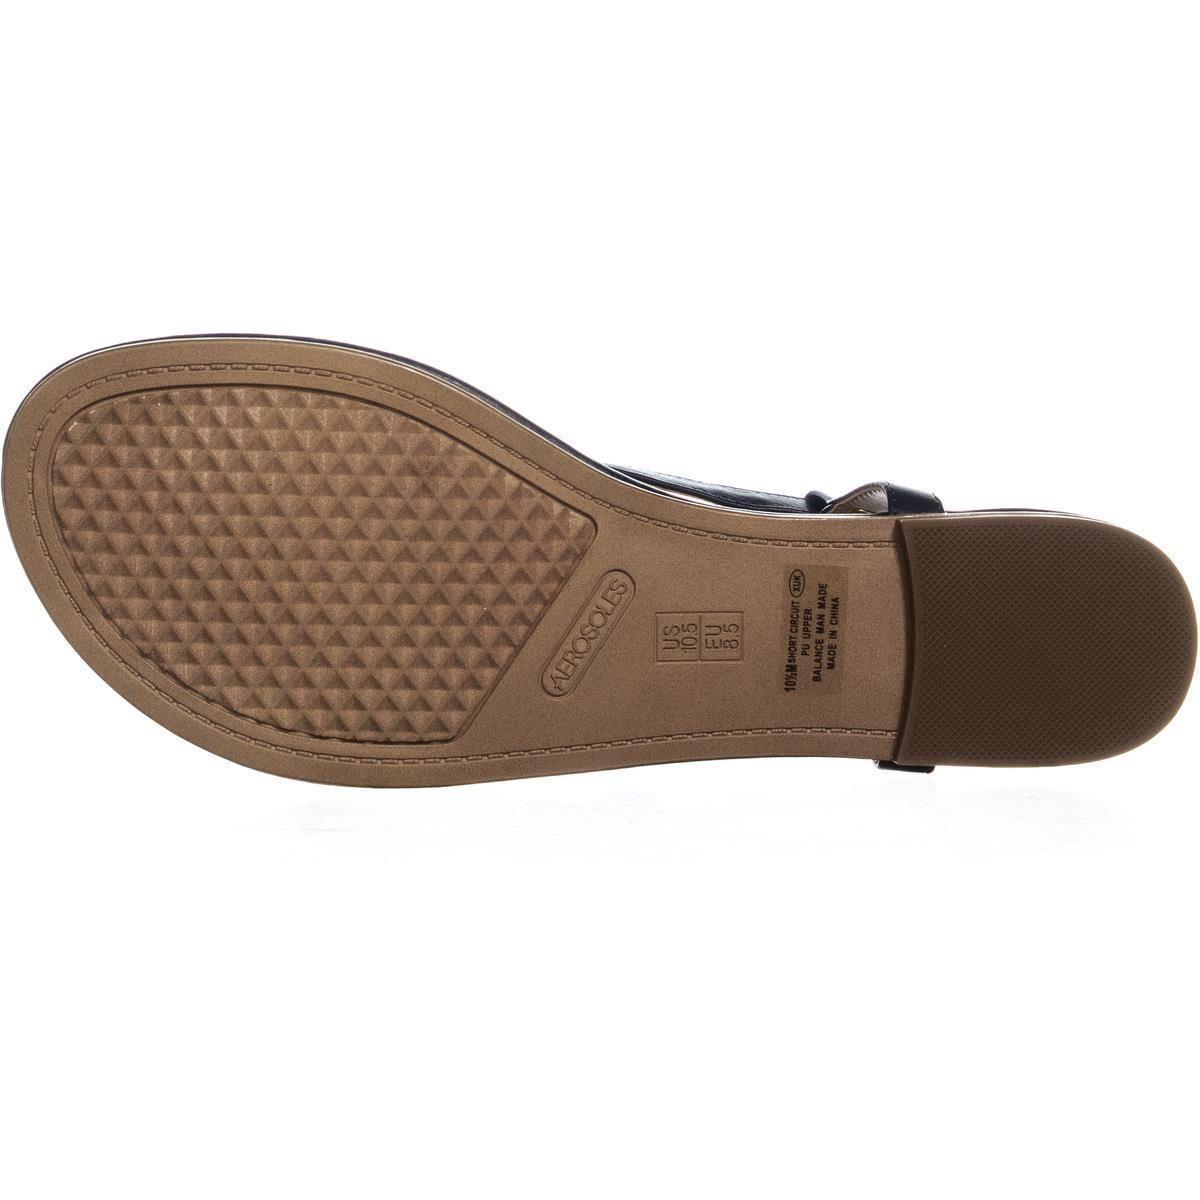 709bfb768042 Aerosoles - Blue Short Circuit Tassle Sandals - Lyst. View fullscreen